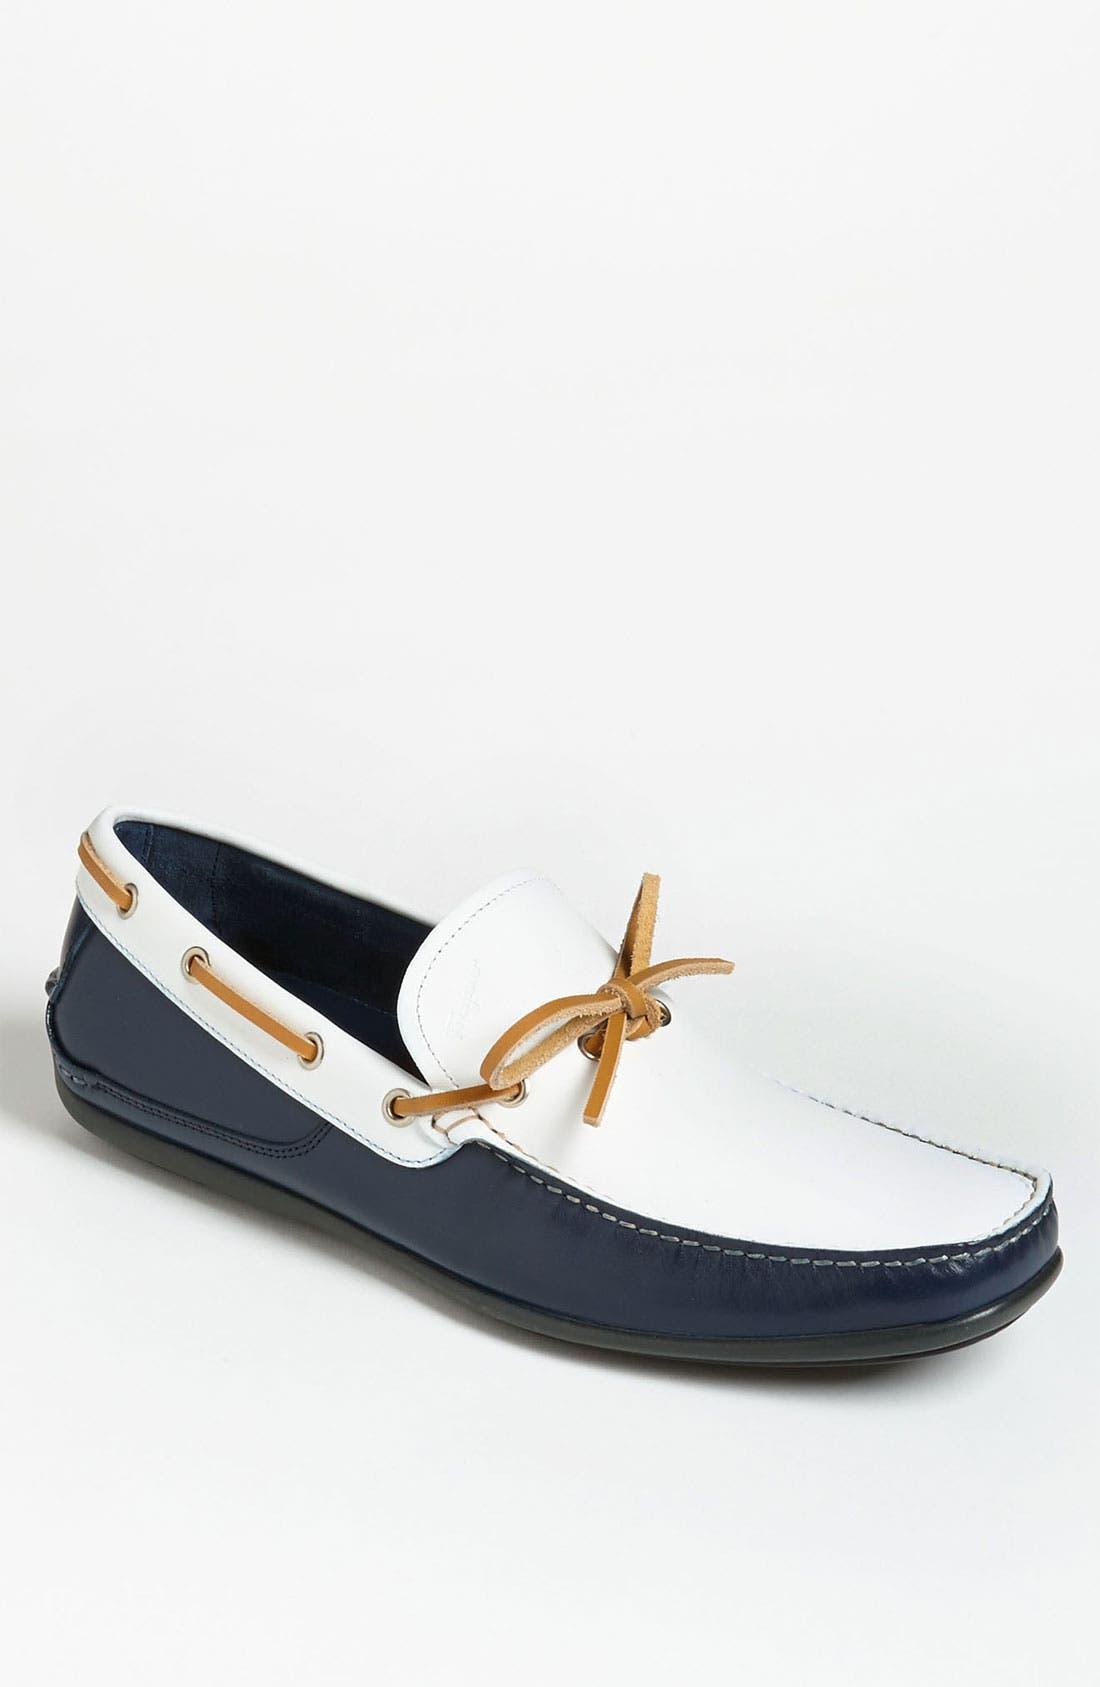 Alternate Image 1 Selected - Salvatore Ferragamo 'Mango' Driving Shoe